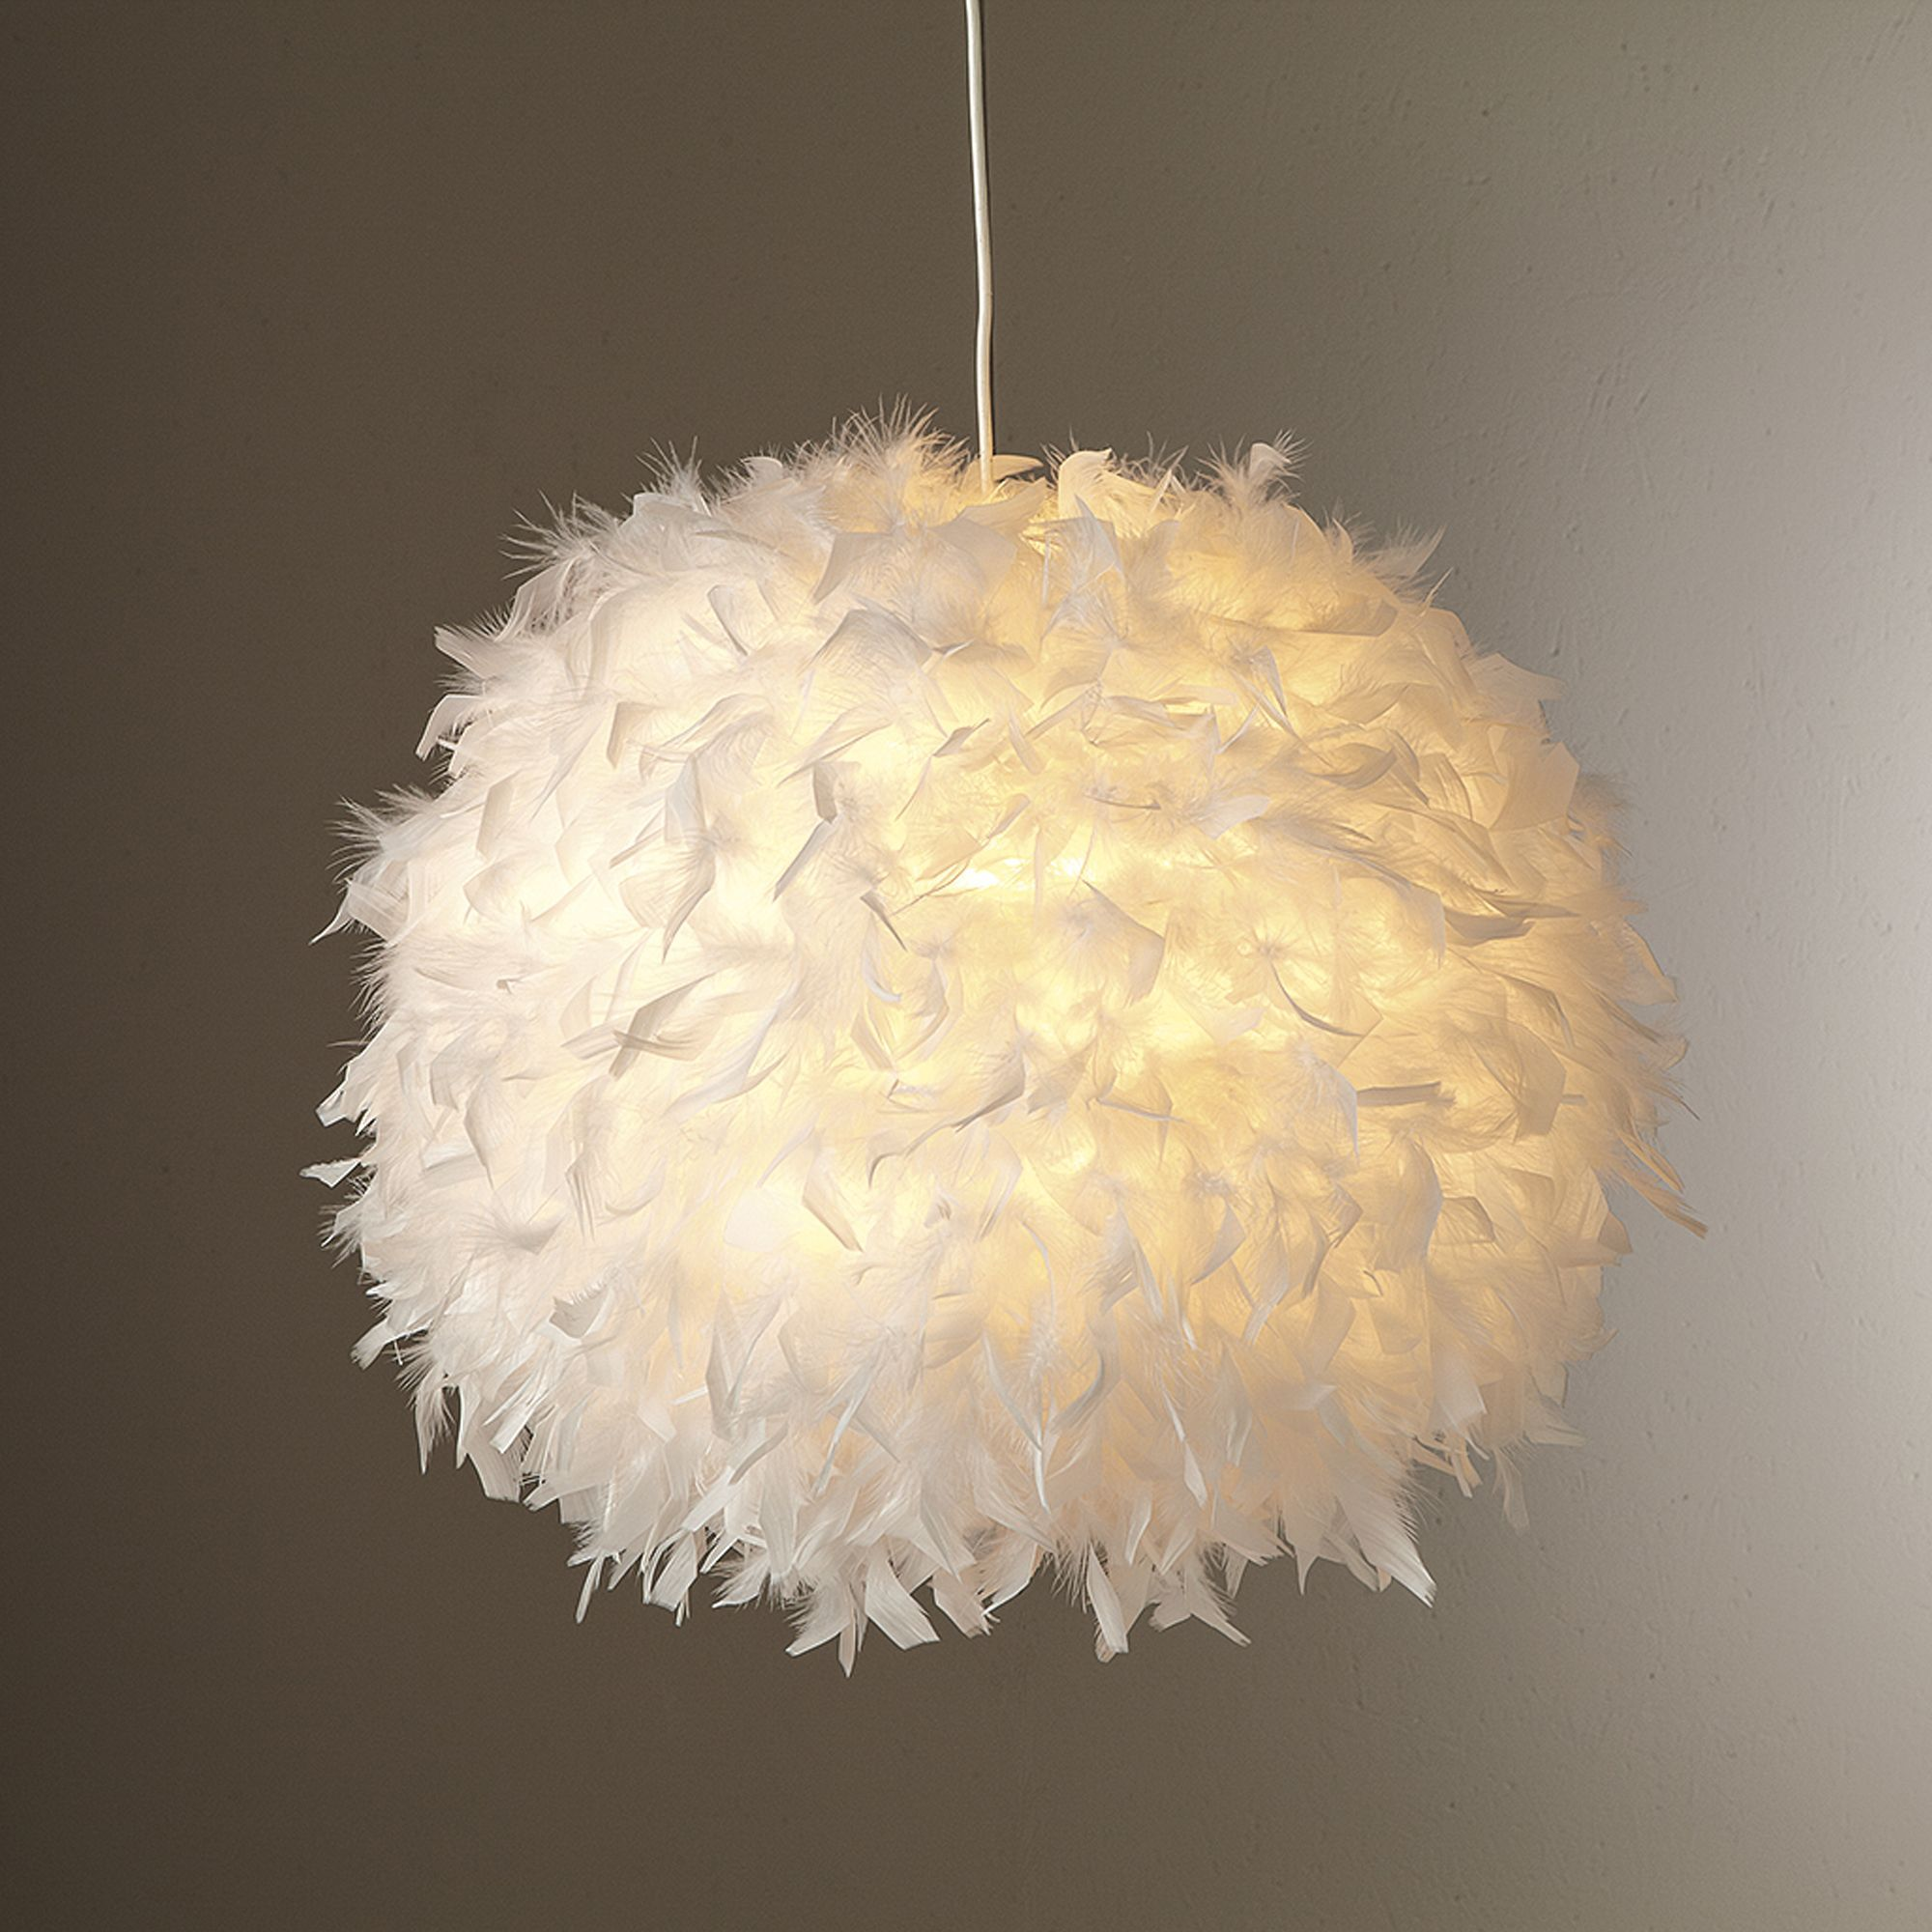 suspension boule en plumes non lectrifi blanc kokot. Black Bedroom Furniture Sets. Home Design Ideas